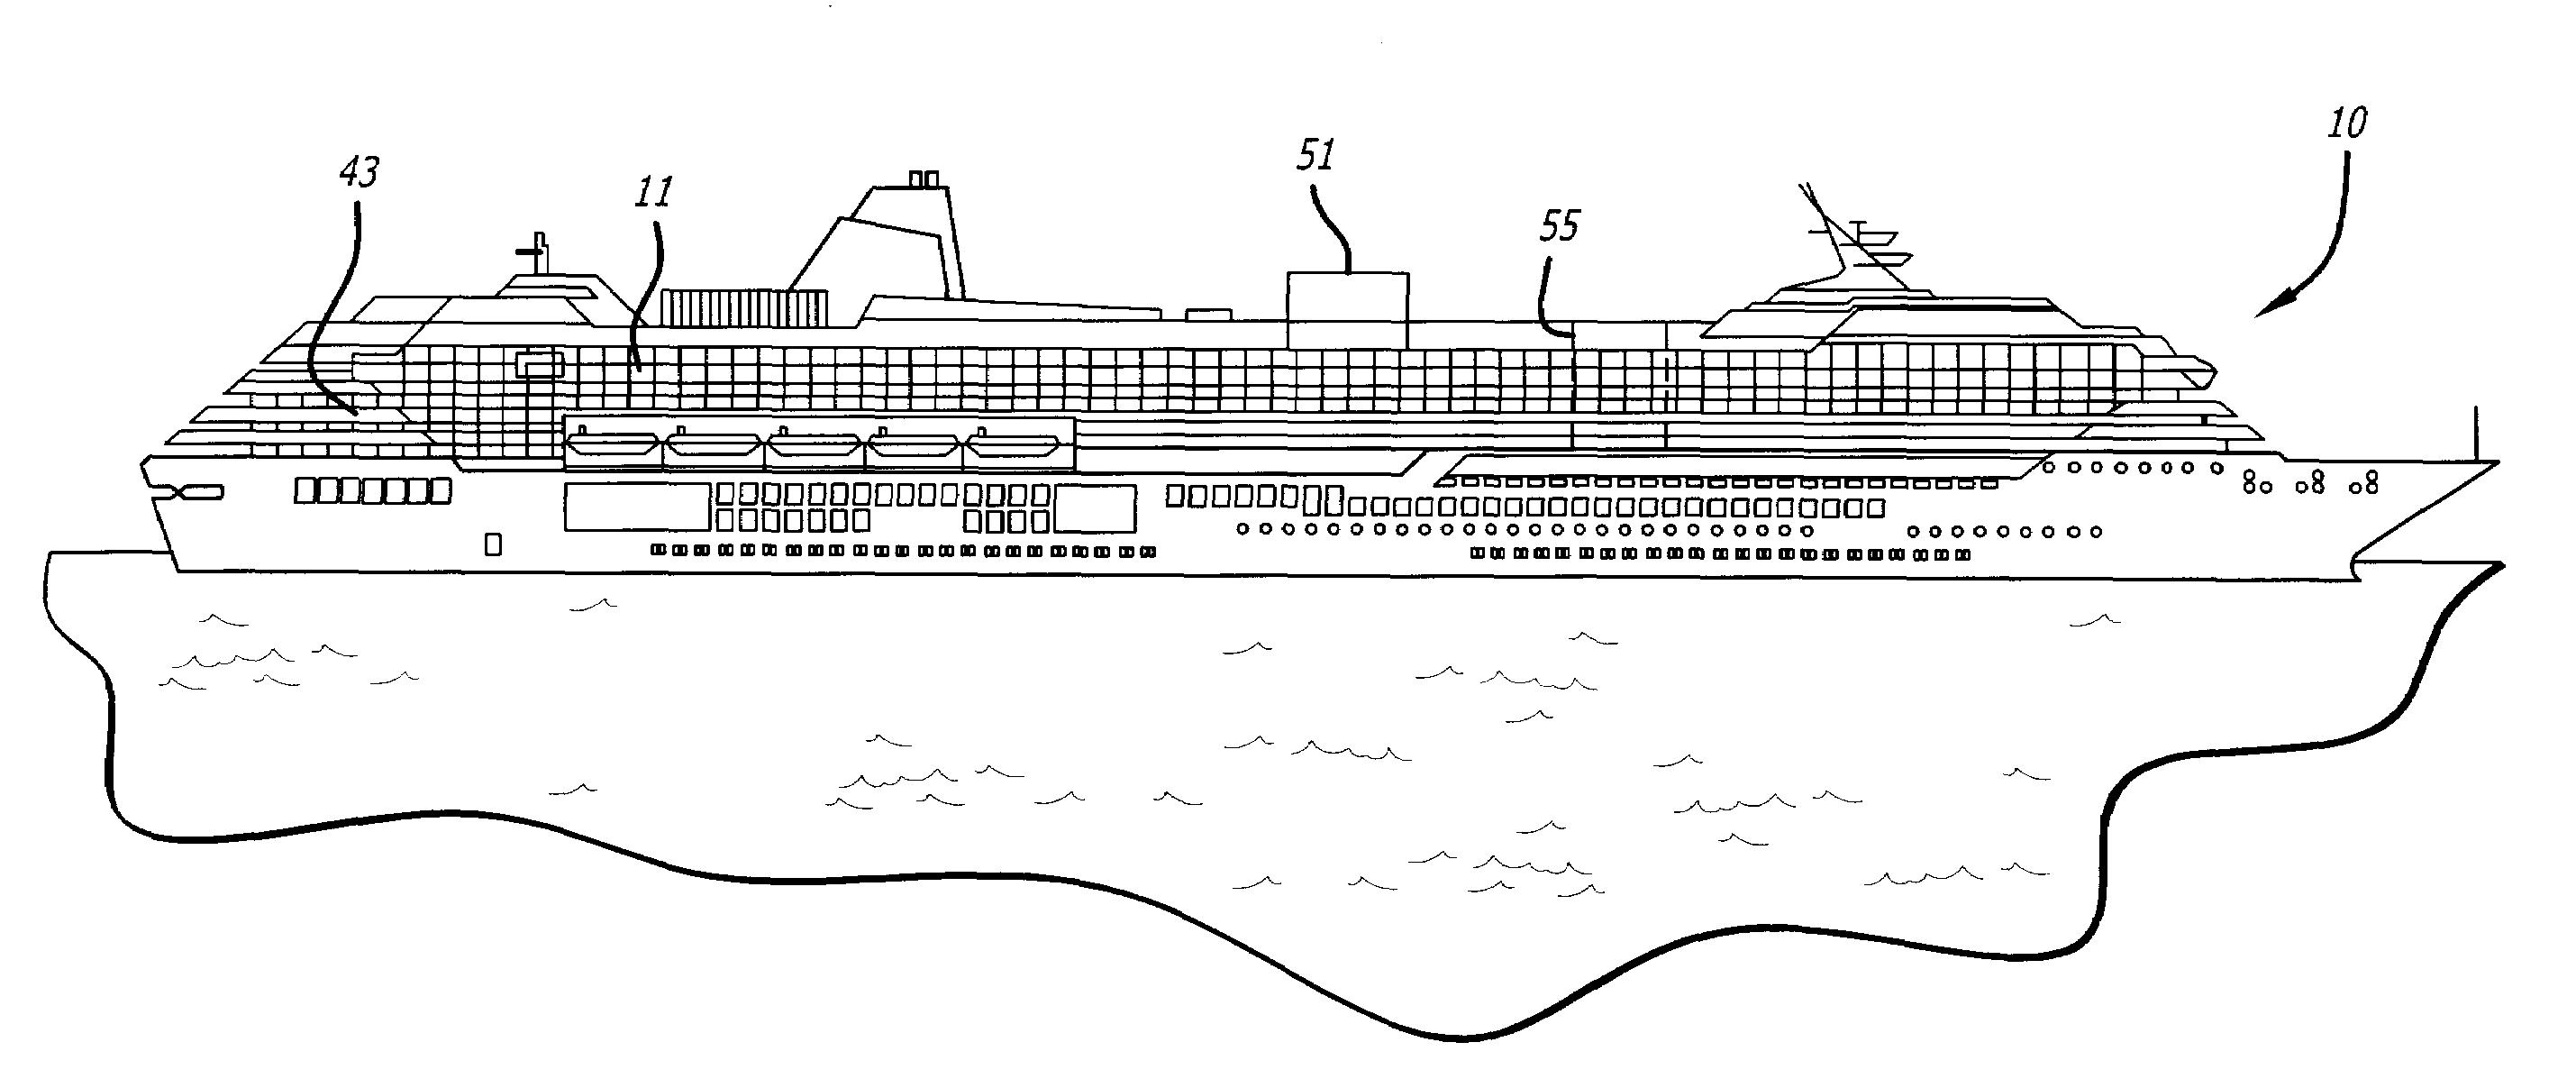 Carnival Cruise Ship Drawing Detlandcom - Draw a cruise ship